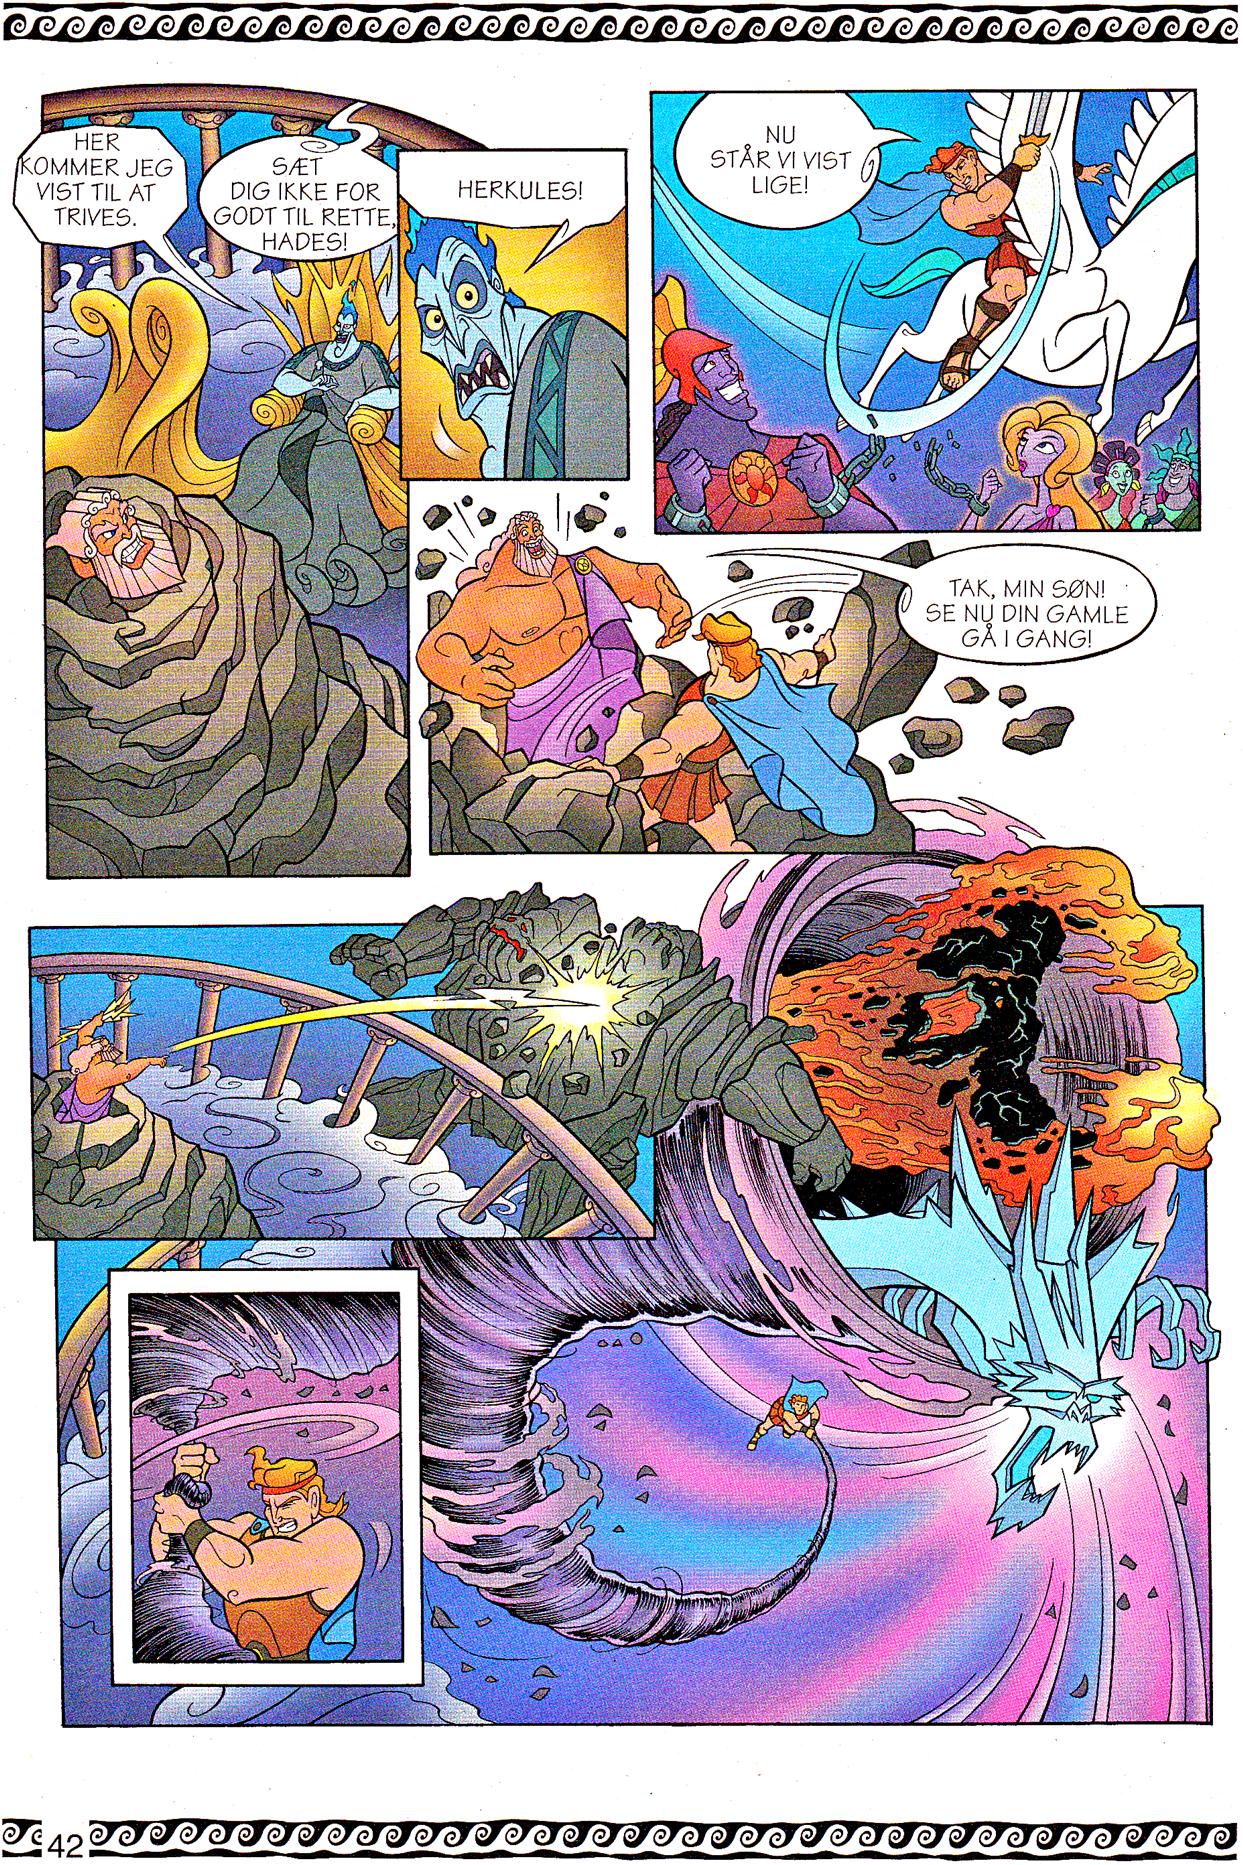 Walt Disney Movie Comics - Hercules (Danish 1997 Version)